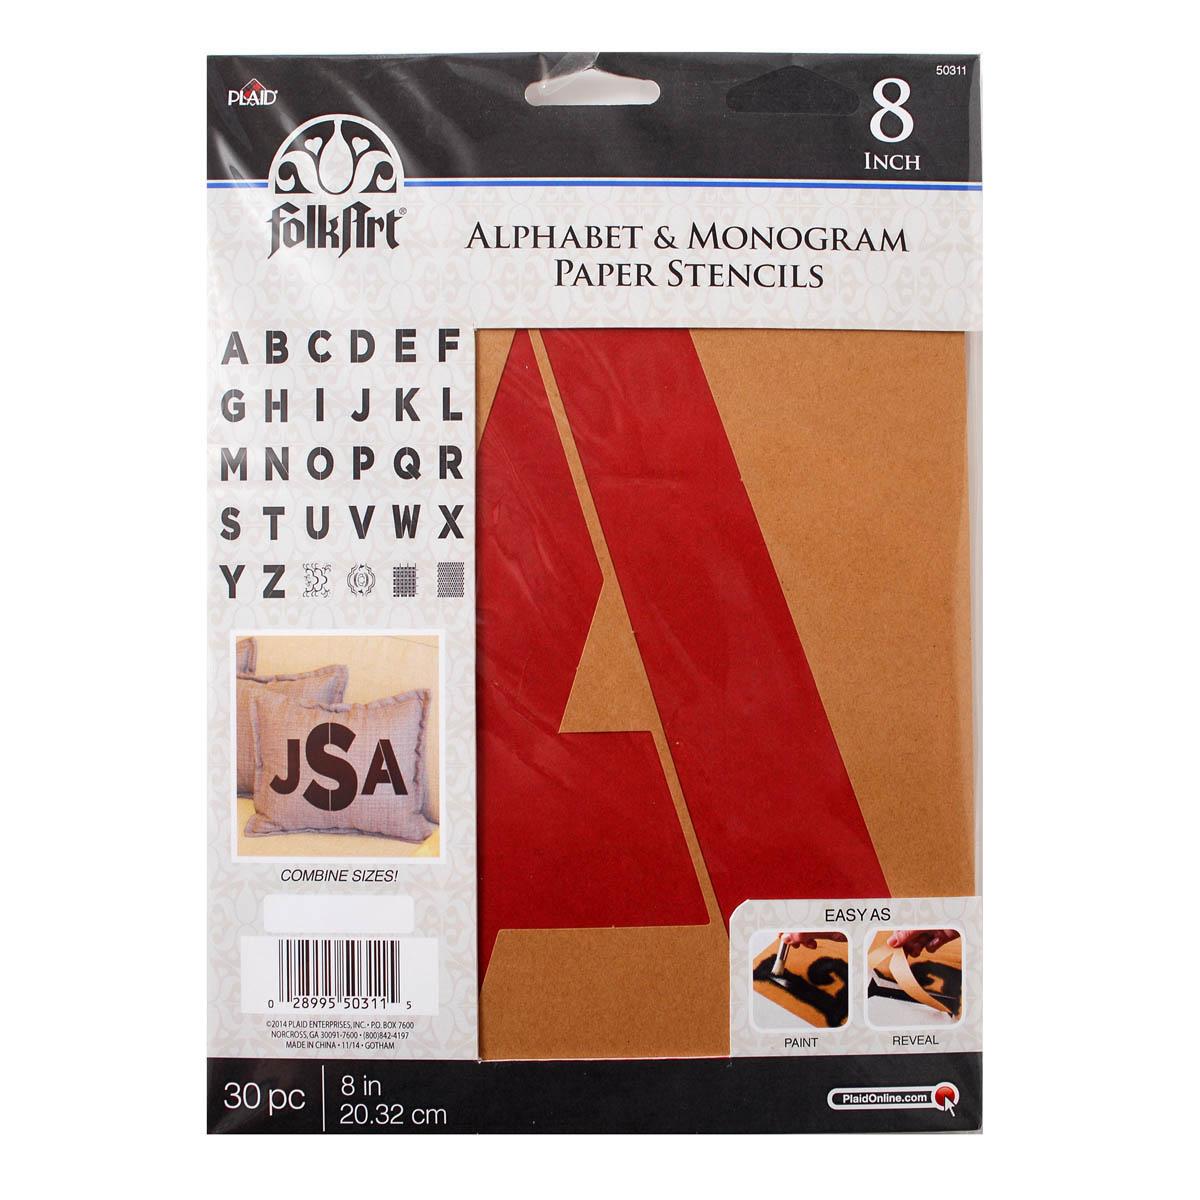 FolkArt ® Alphabet & Monogram Paper Stencils - Bold Font, 8